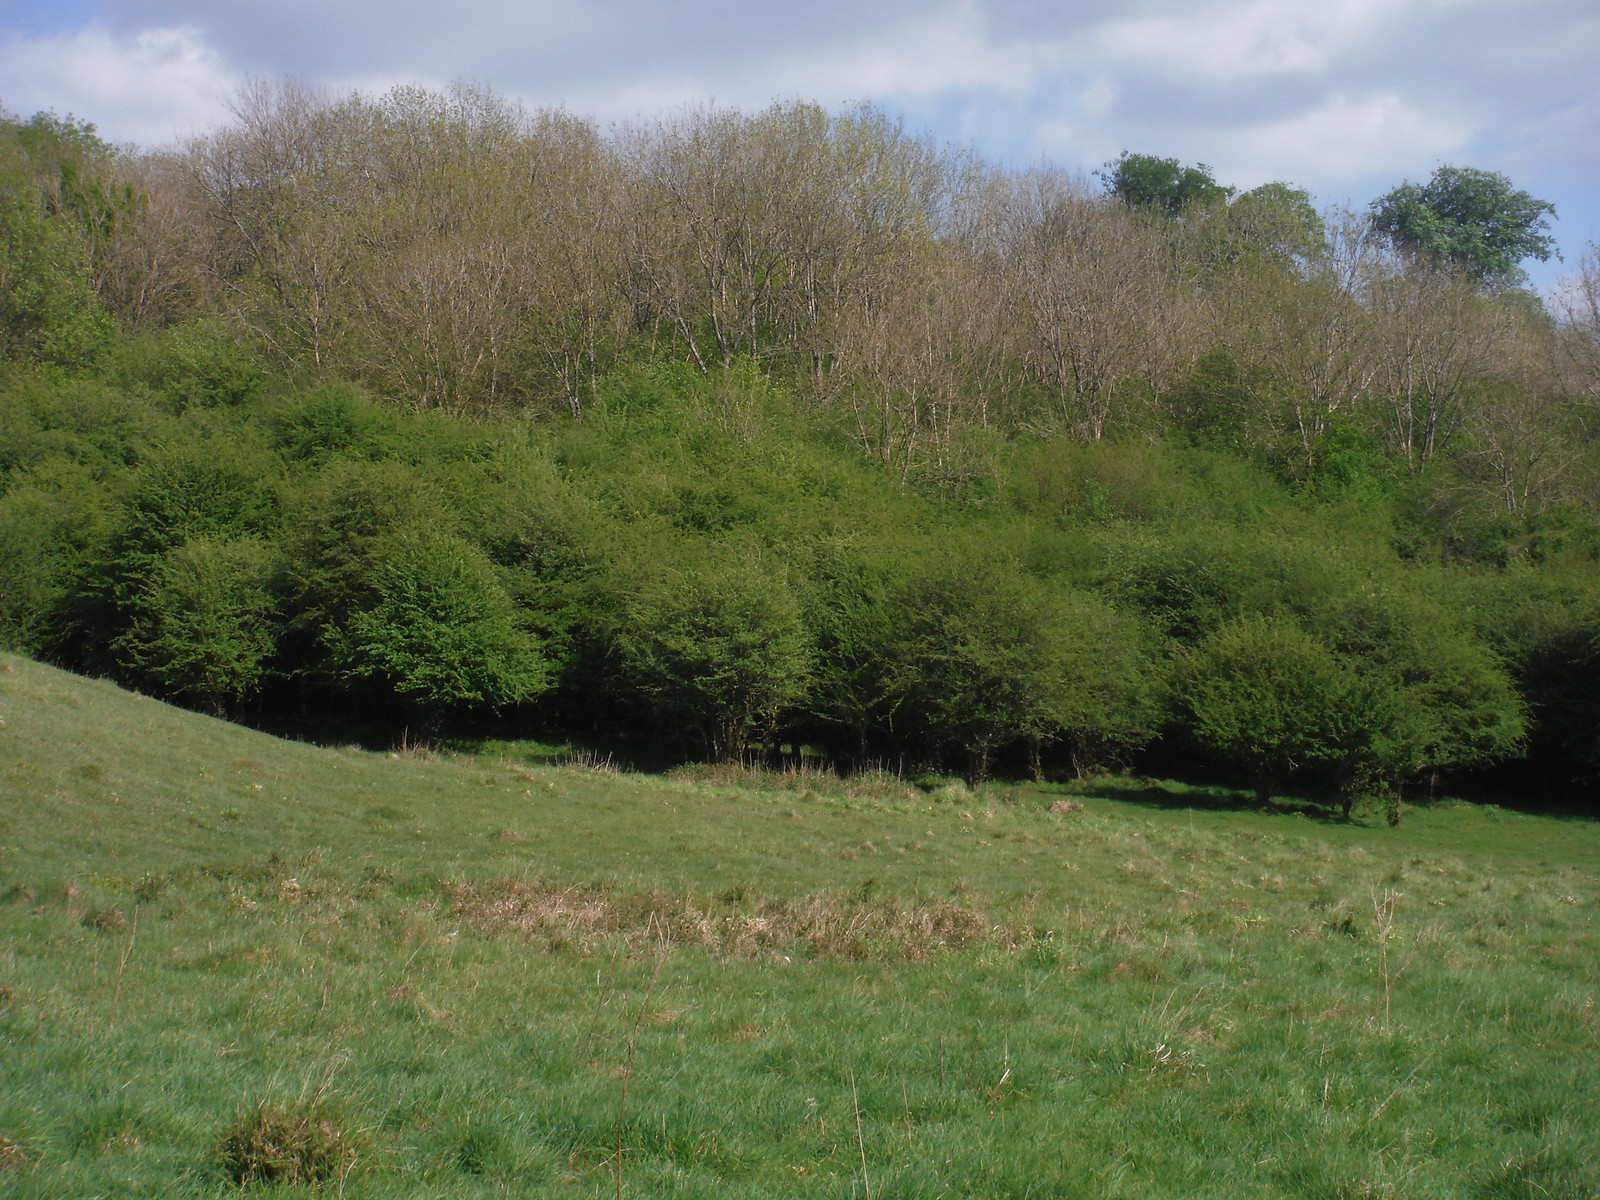 Trees in Bramshott Bottom SWC Walk Rowlands Castle Circular - Extension